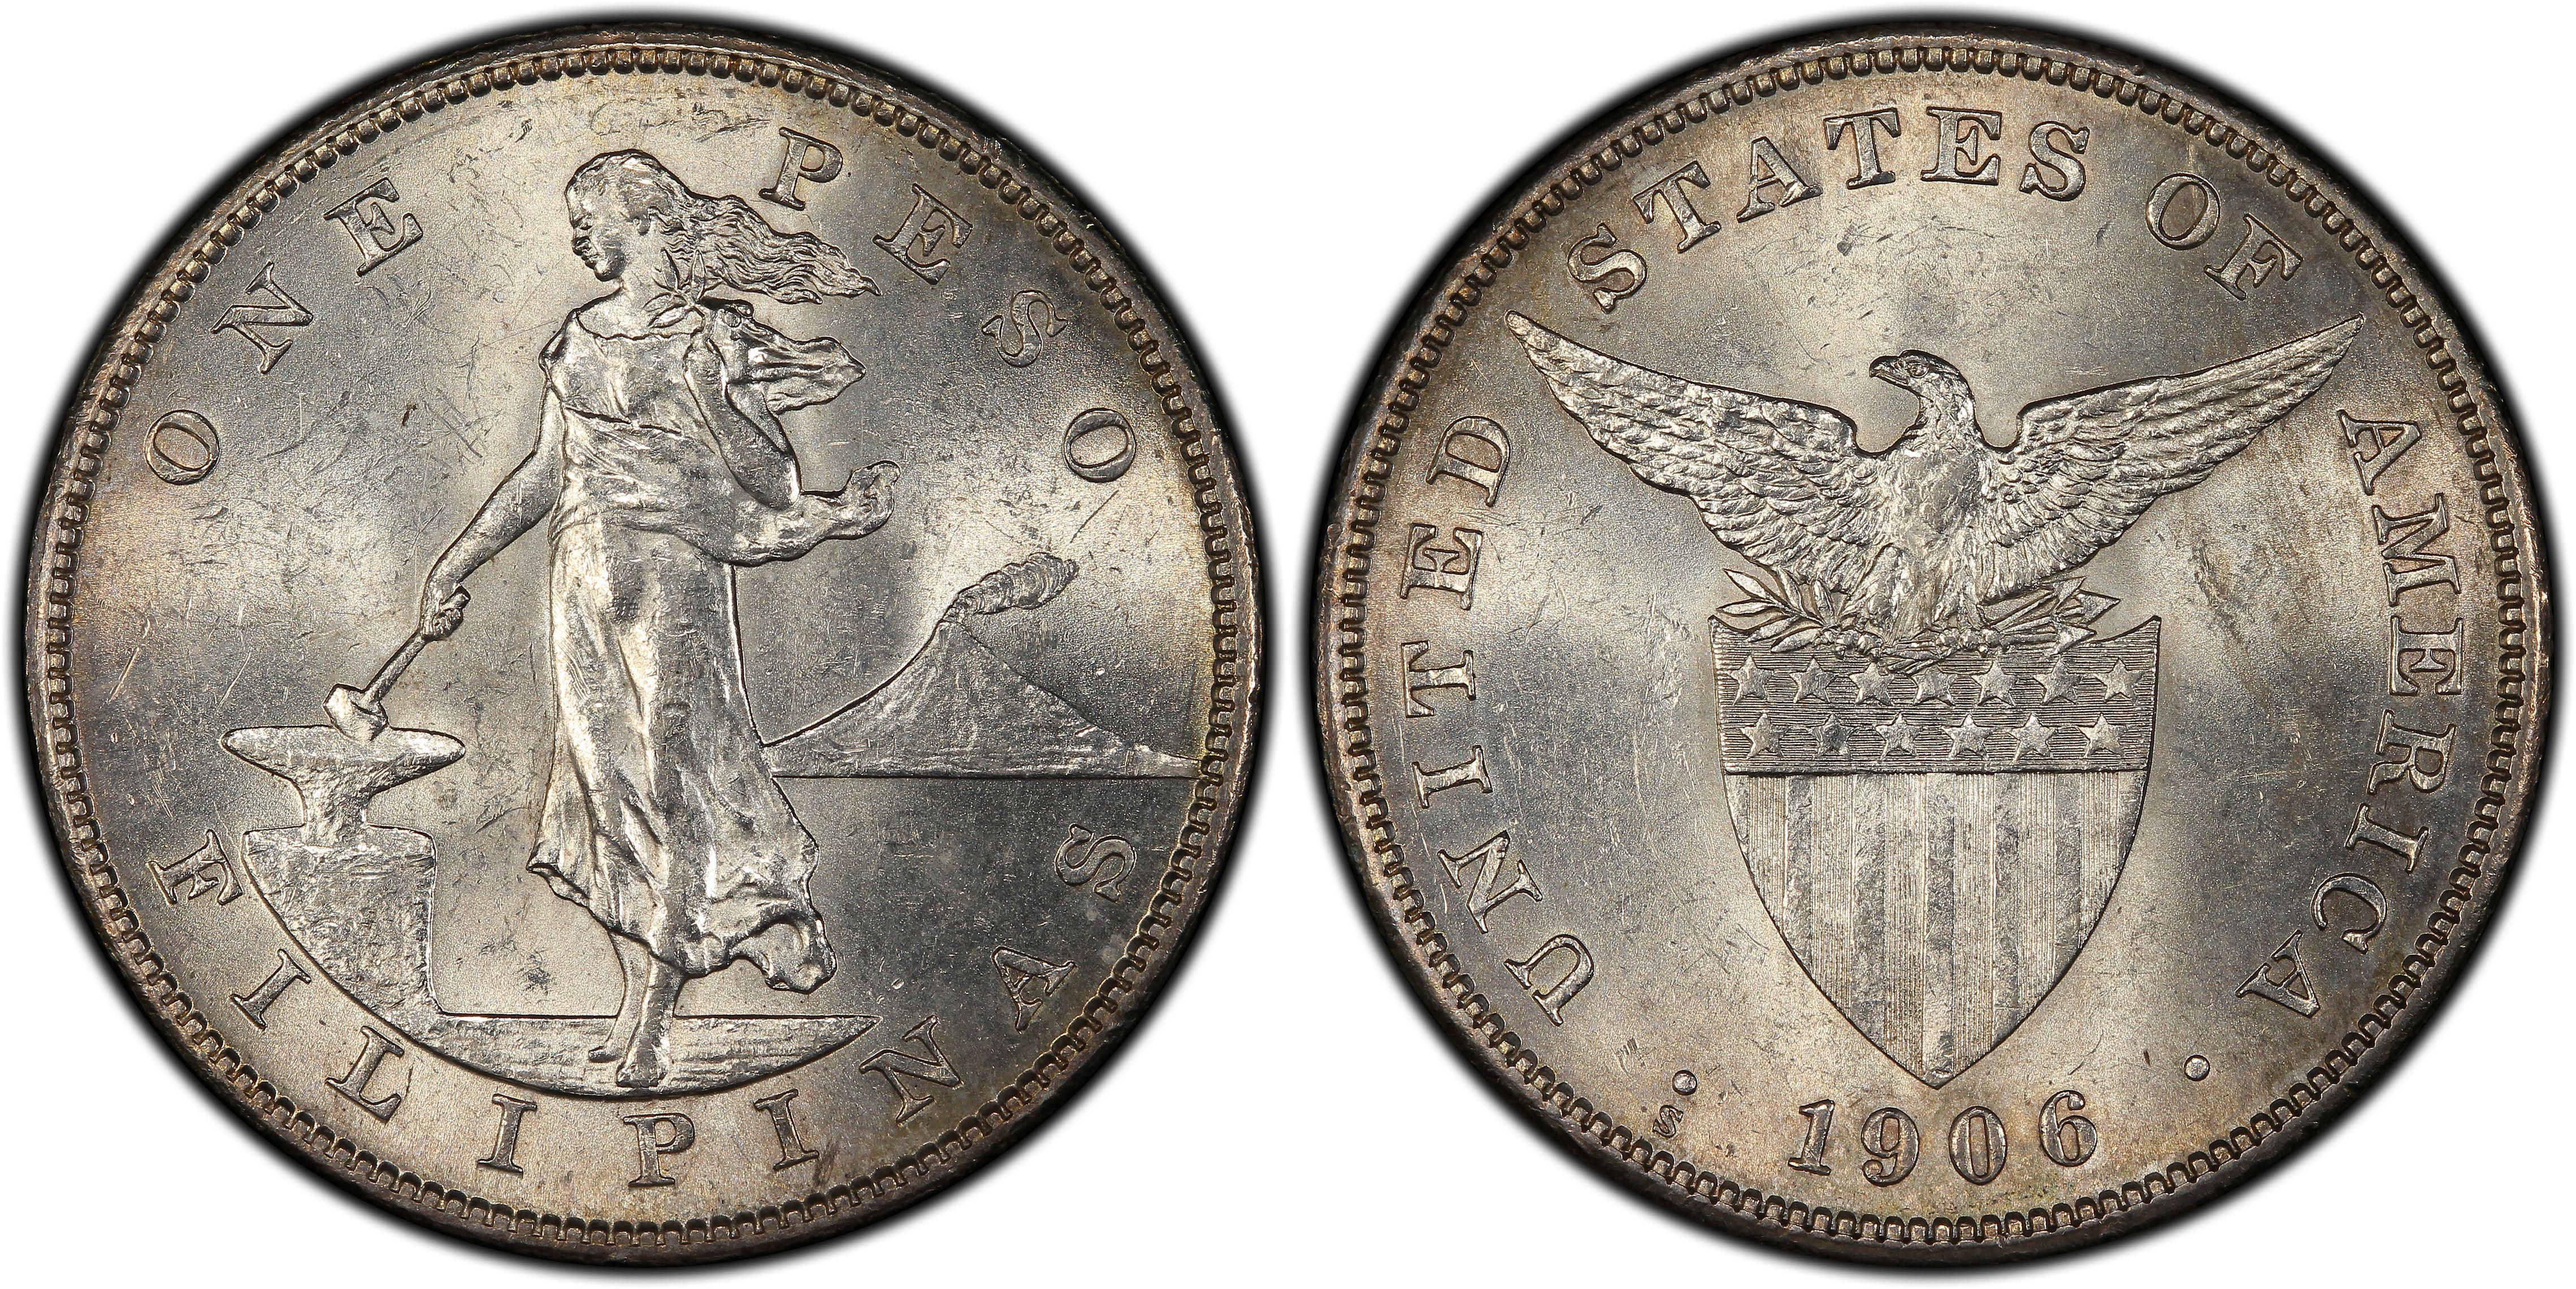 1906 S Peso Regular Strike U